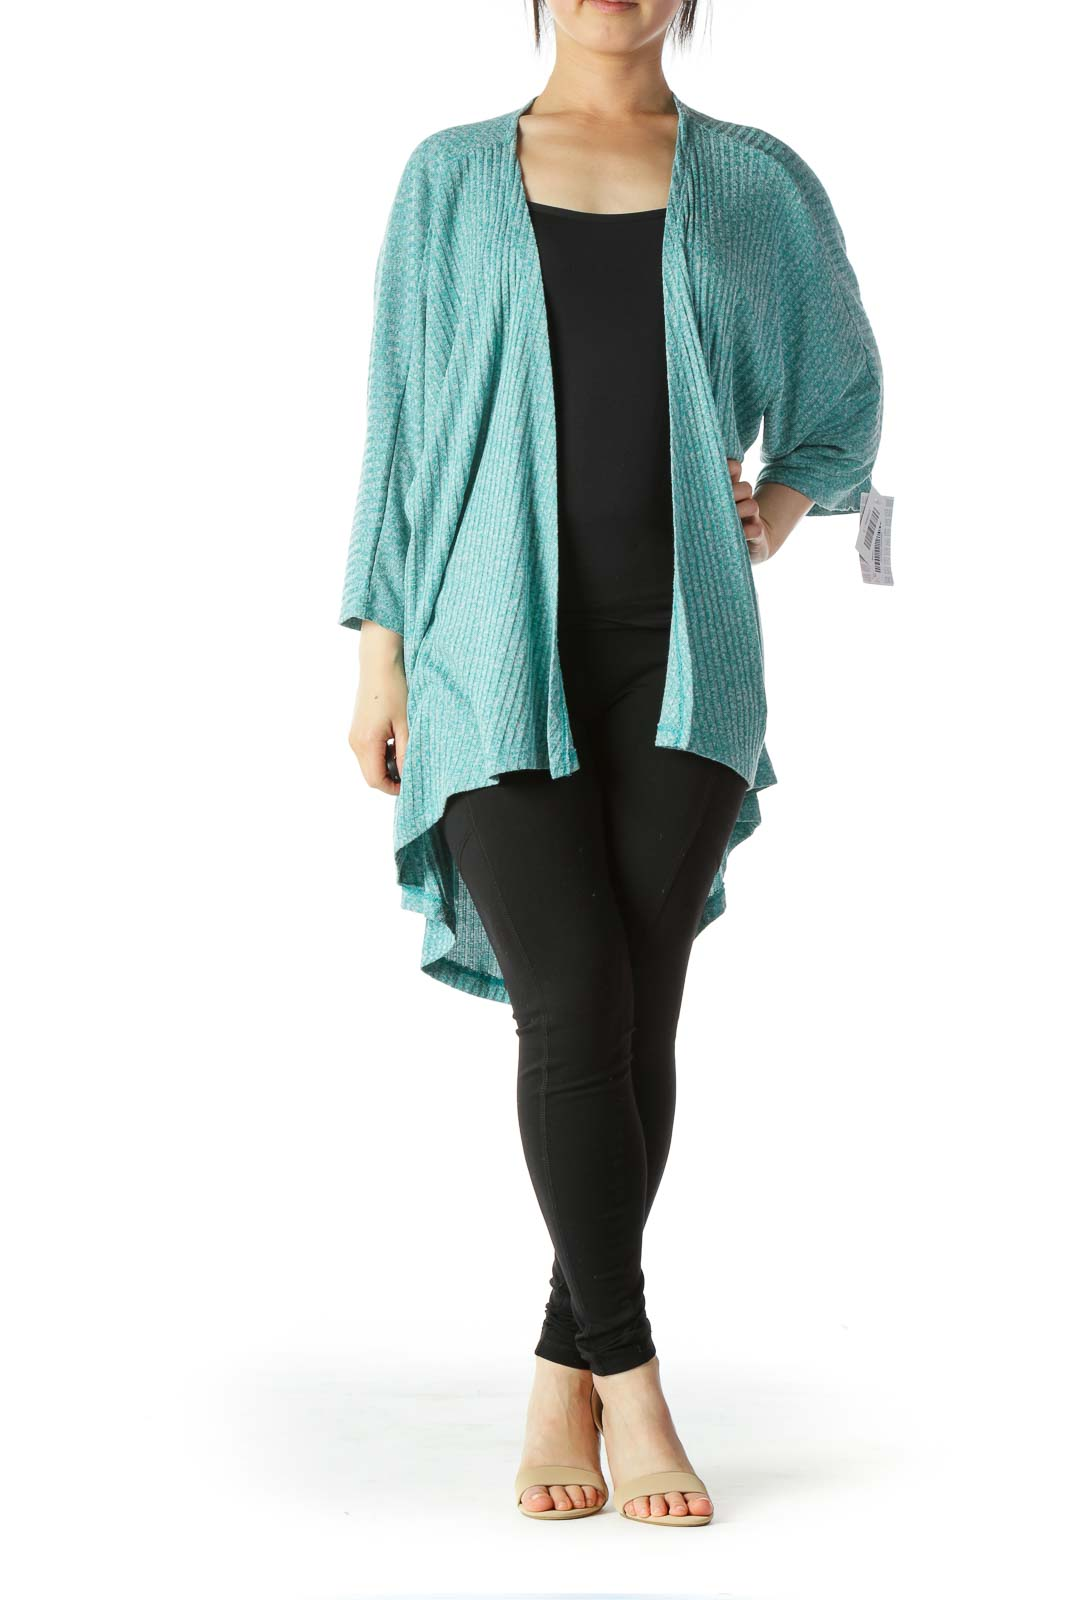 Blue Gray Short-Sleeve Stretch Knit Cardigan